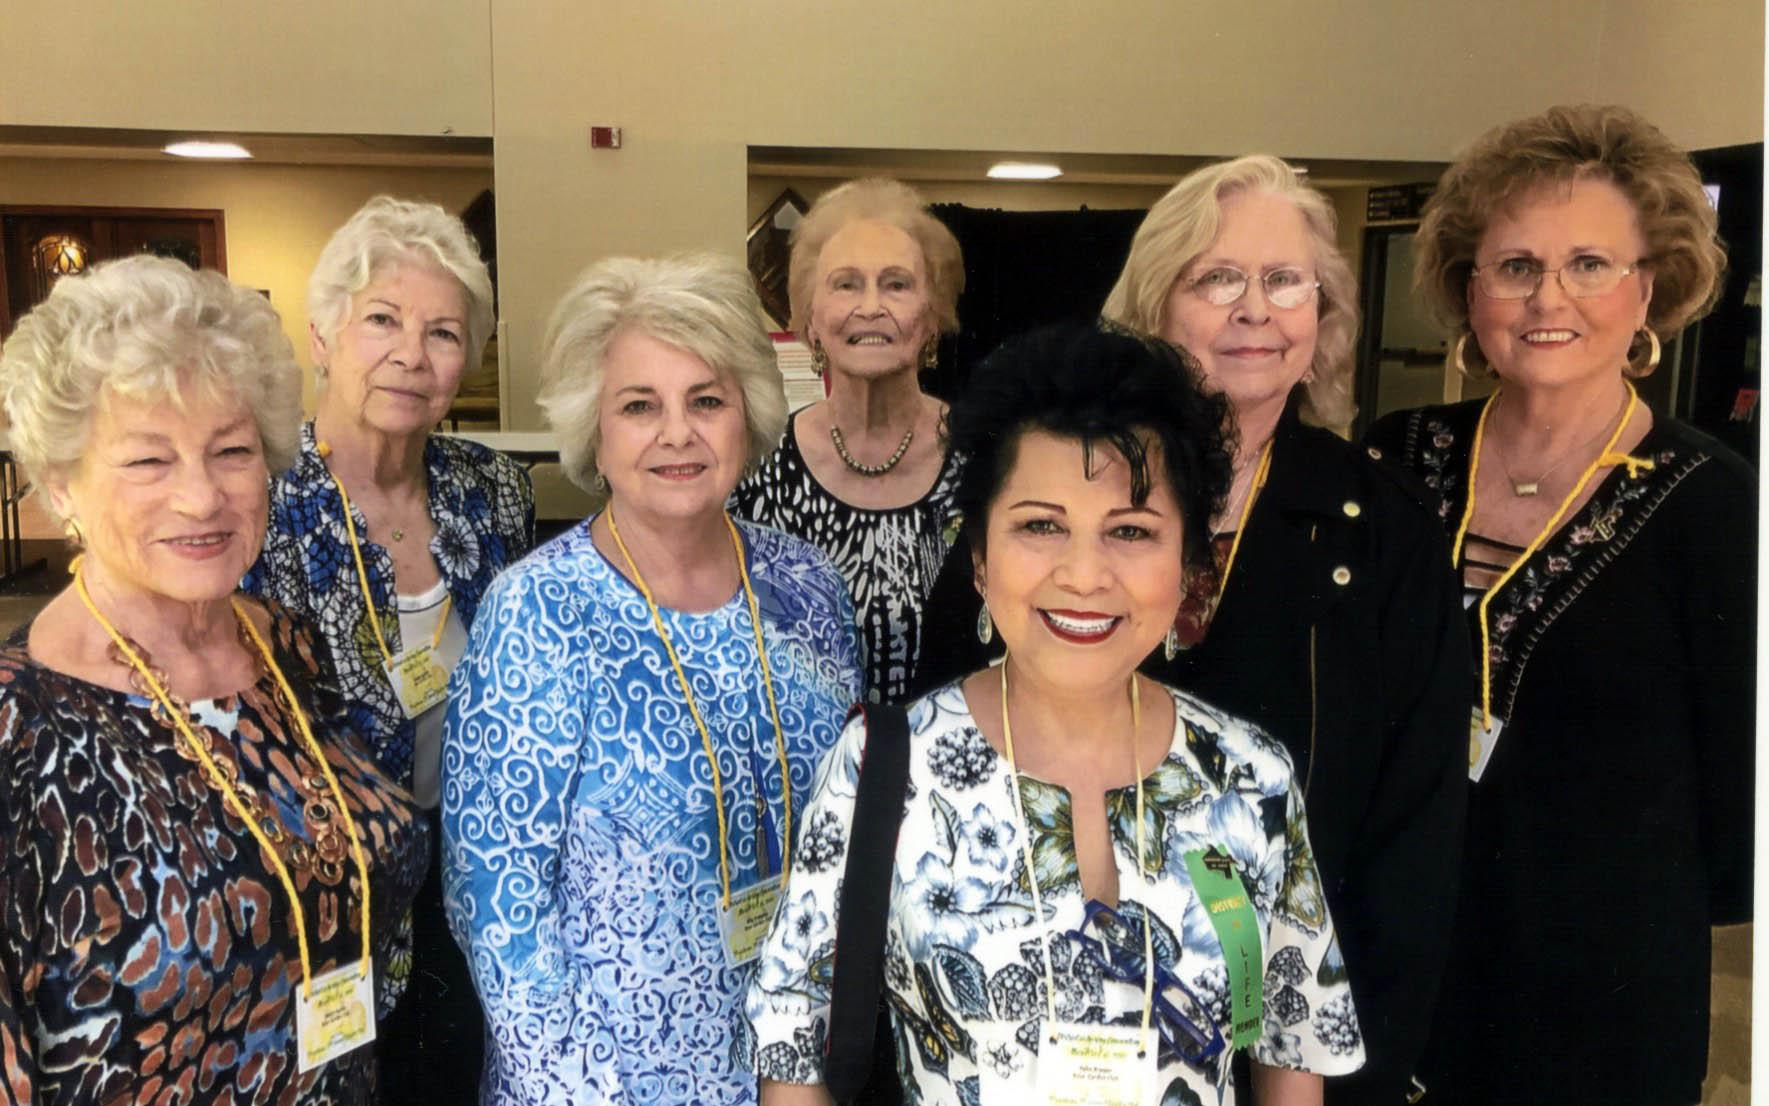 Janice Martin, Janella Garrett, Rita Freeman, Vida Brine, Yulin Brewer, Beth Brine and Janis Stringfellow